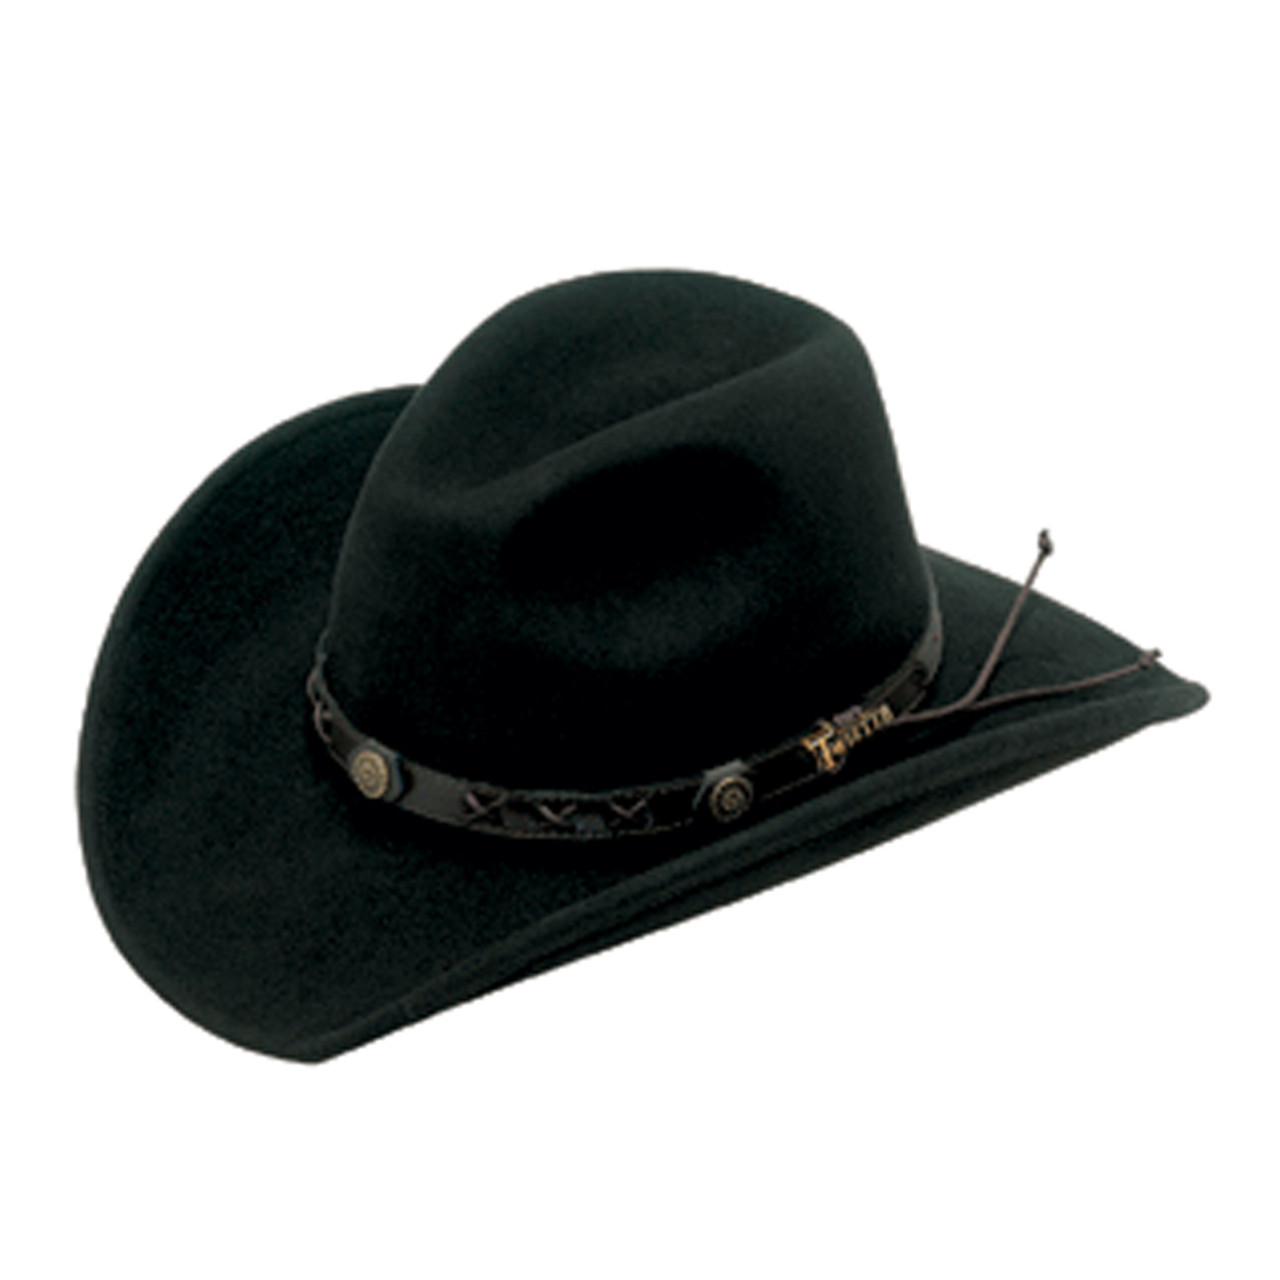 DOUBLE S BLACK DAKOTA CRUSHABLE FELT COWBOY HAT 7211001 a7274117acc